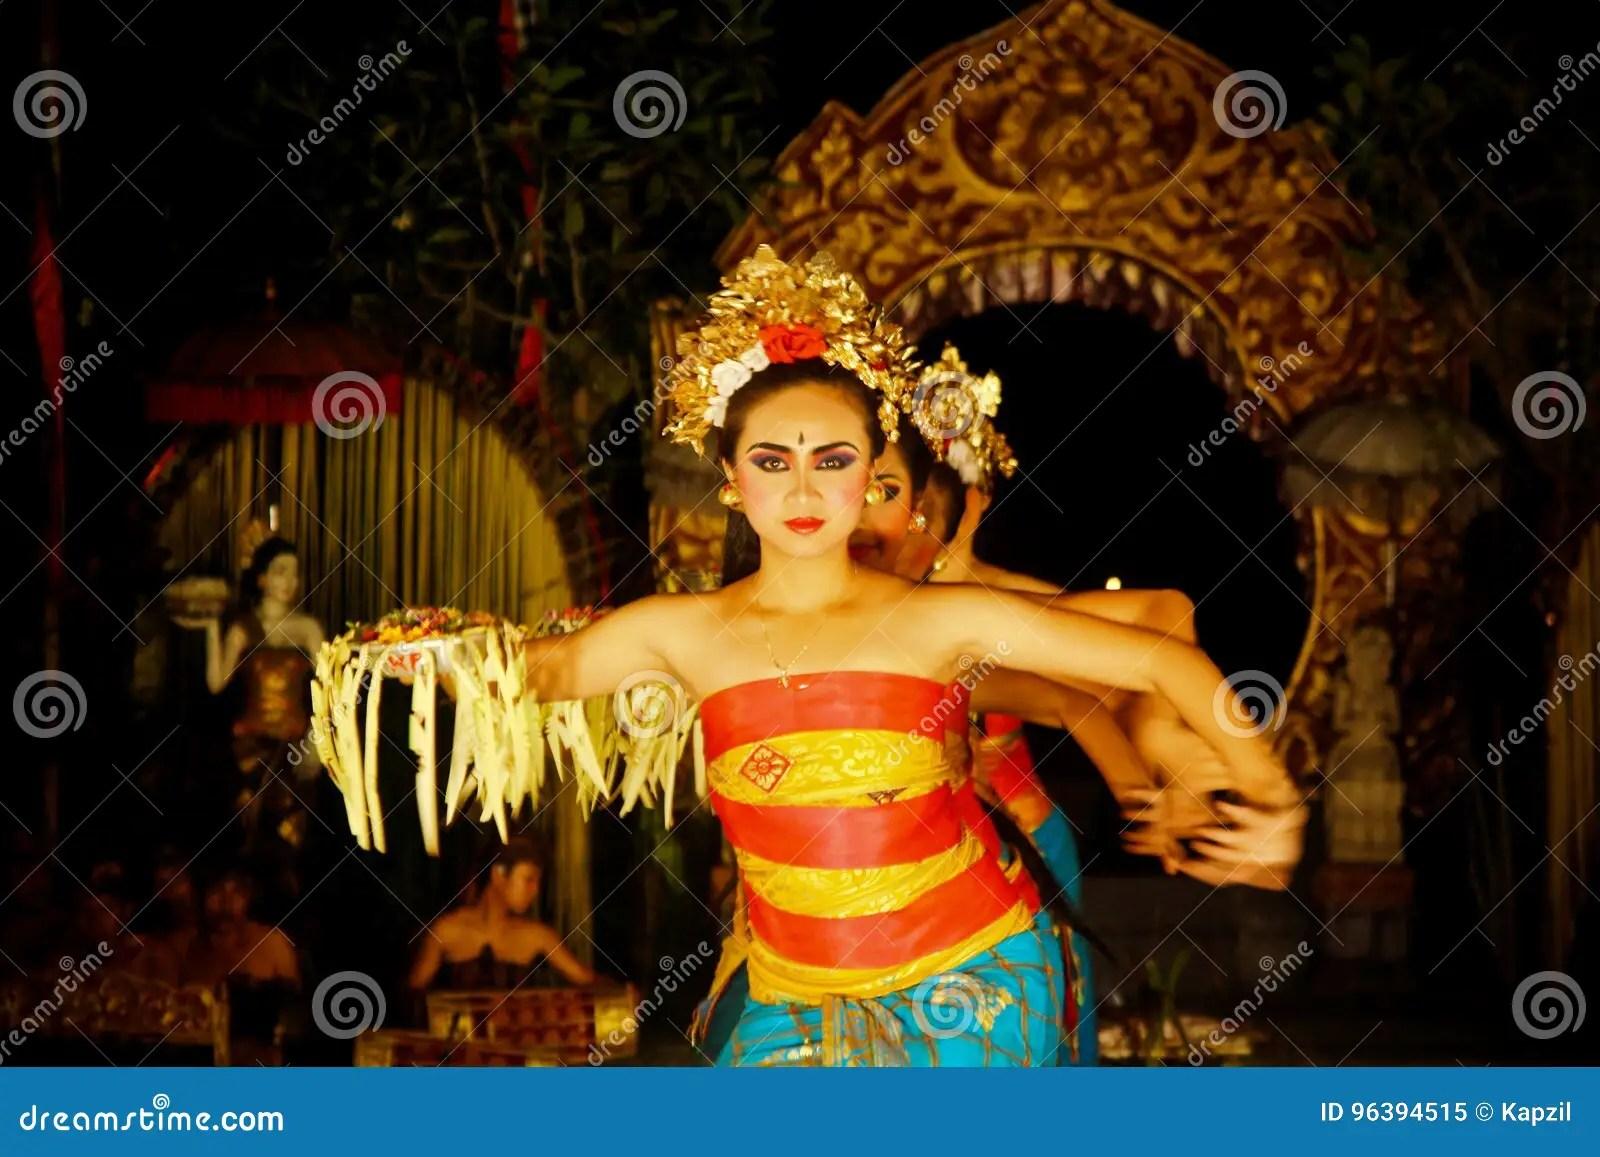 traditional bali dancers editorial